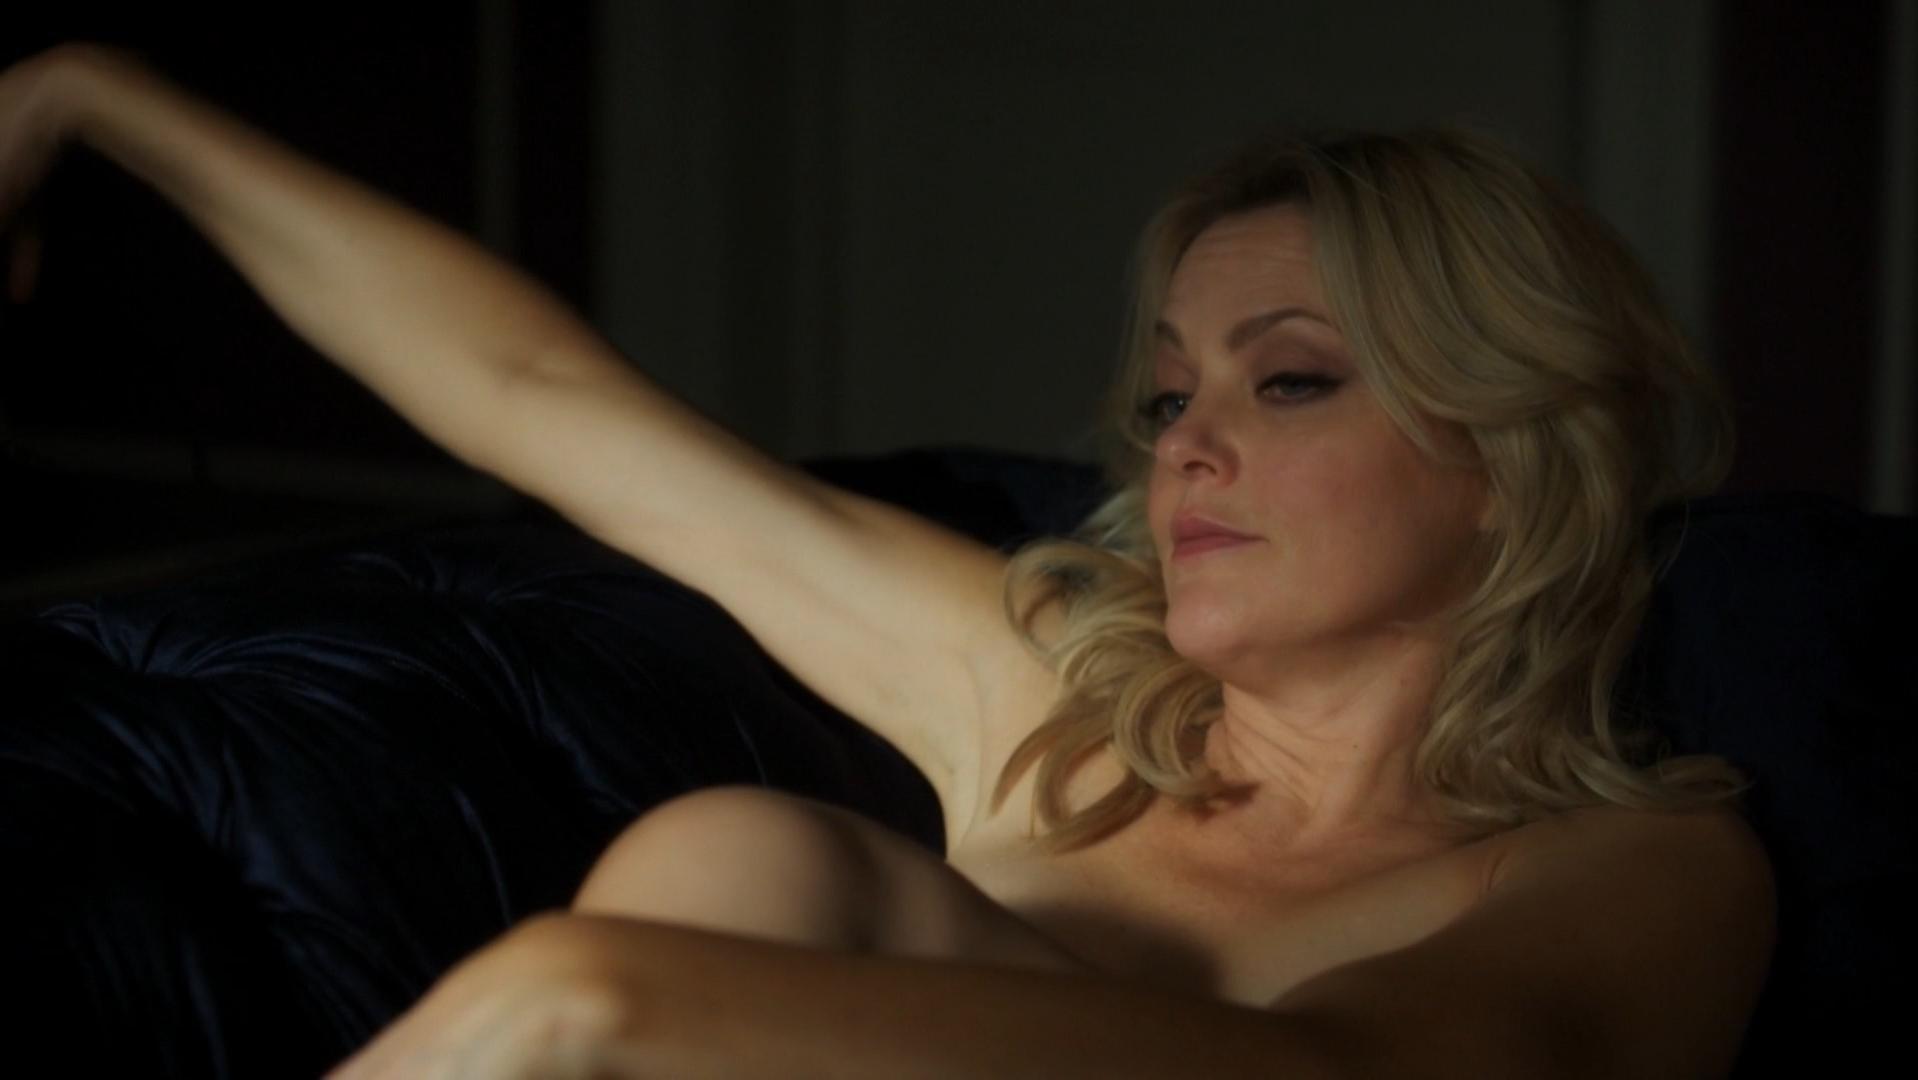 Elaine hendrix nude phrase necessary